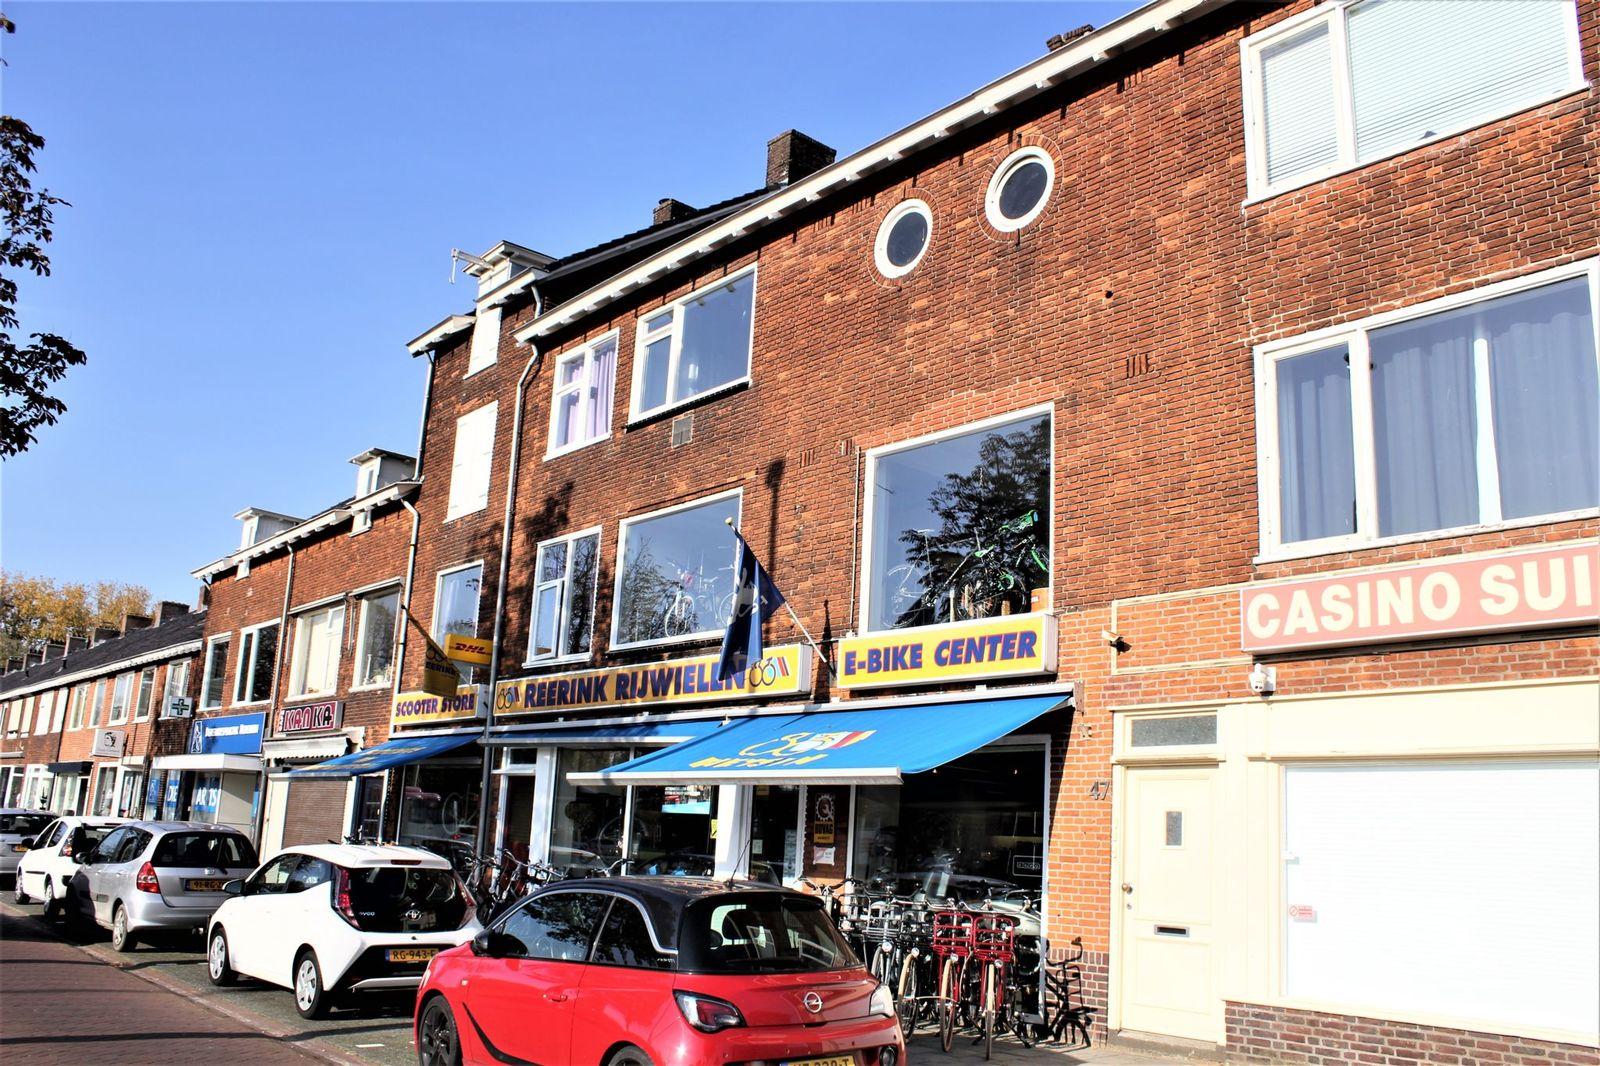 Huissensestraat, Arnhem